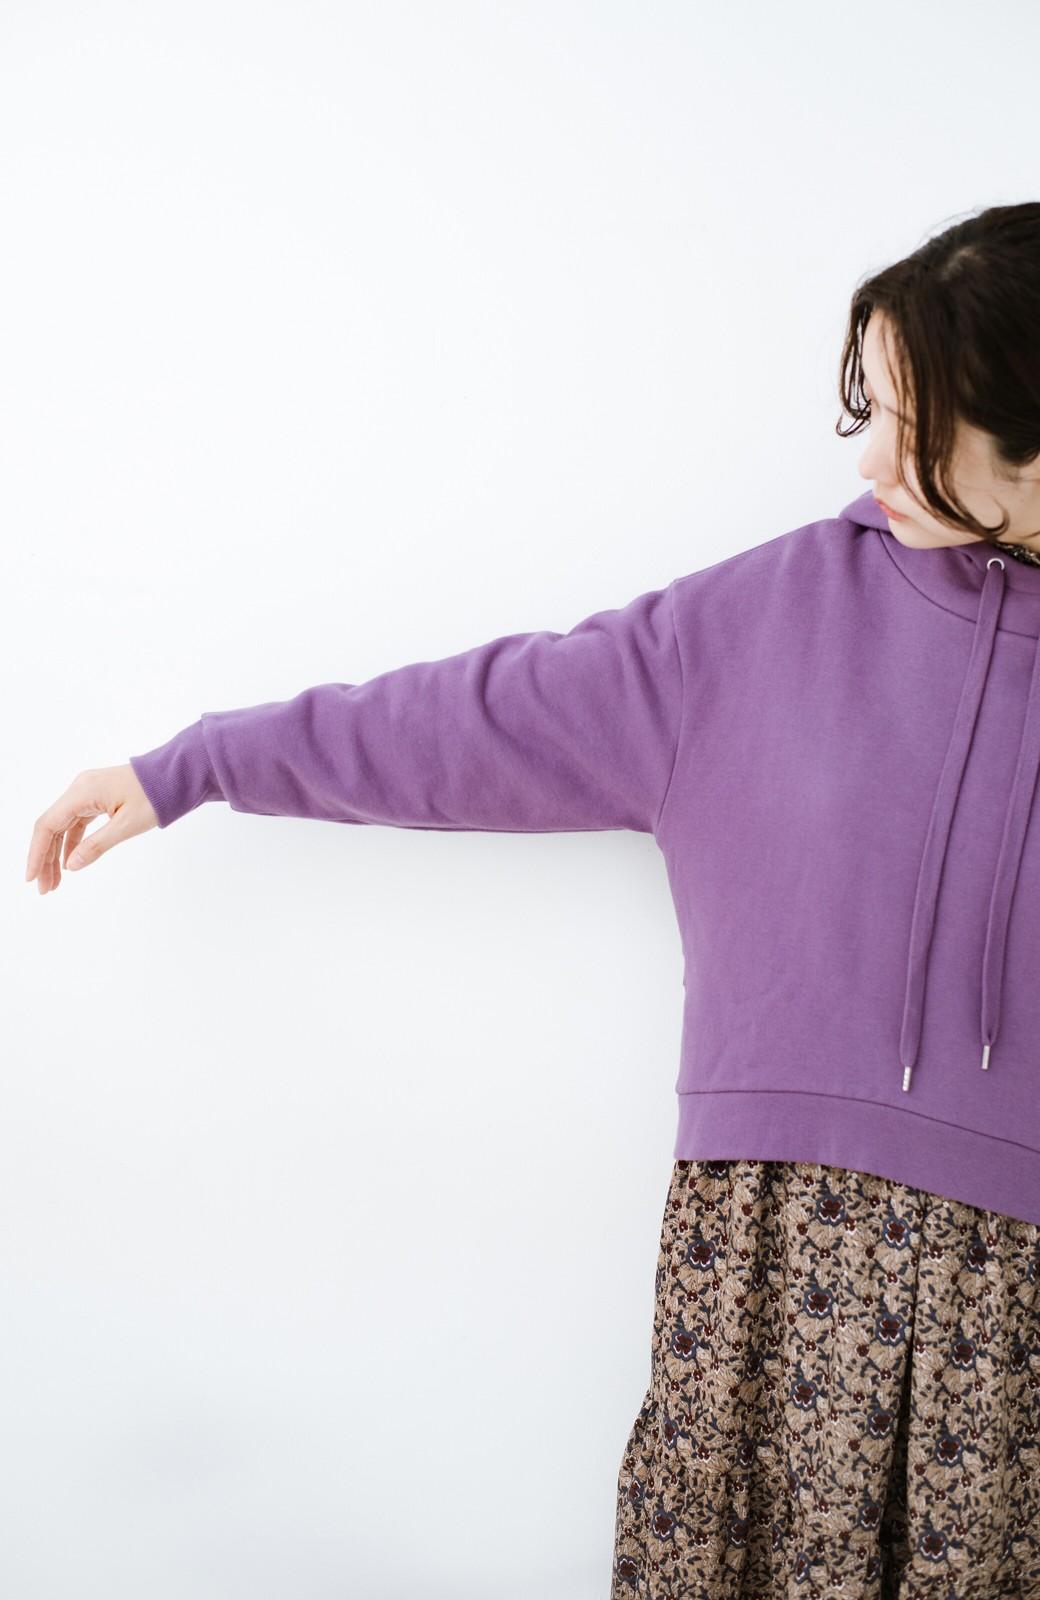 haco! PBPオーガニックコットン 短め丈でバランスよく着られる裏起毛パーカー <パープル>の商品写真15